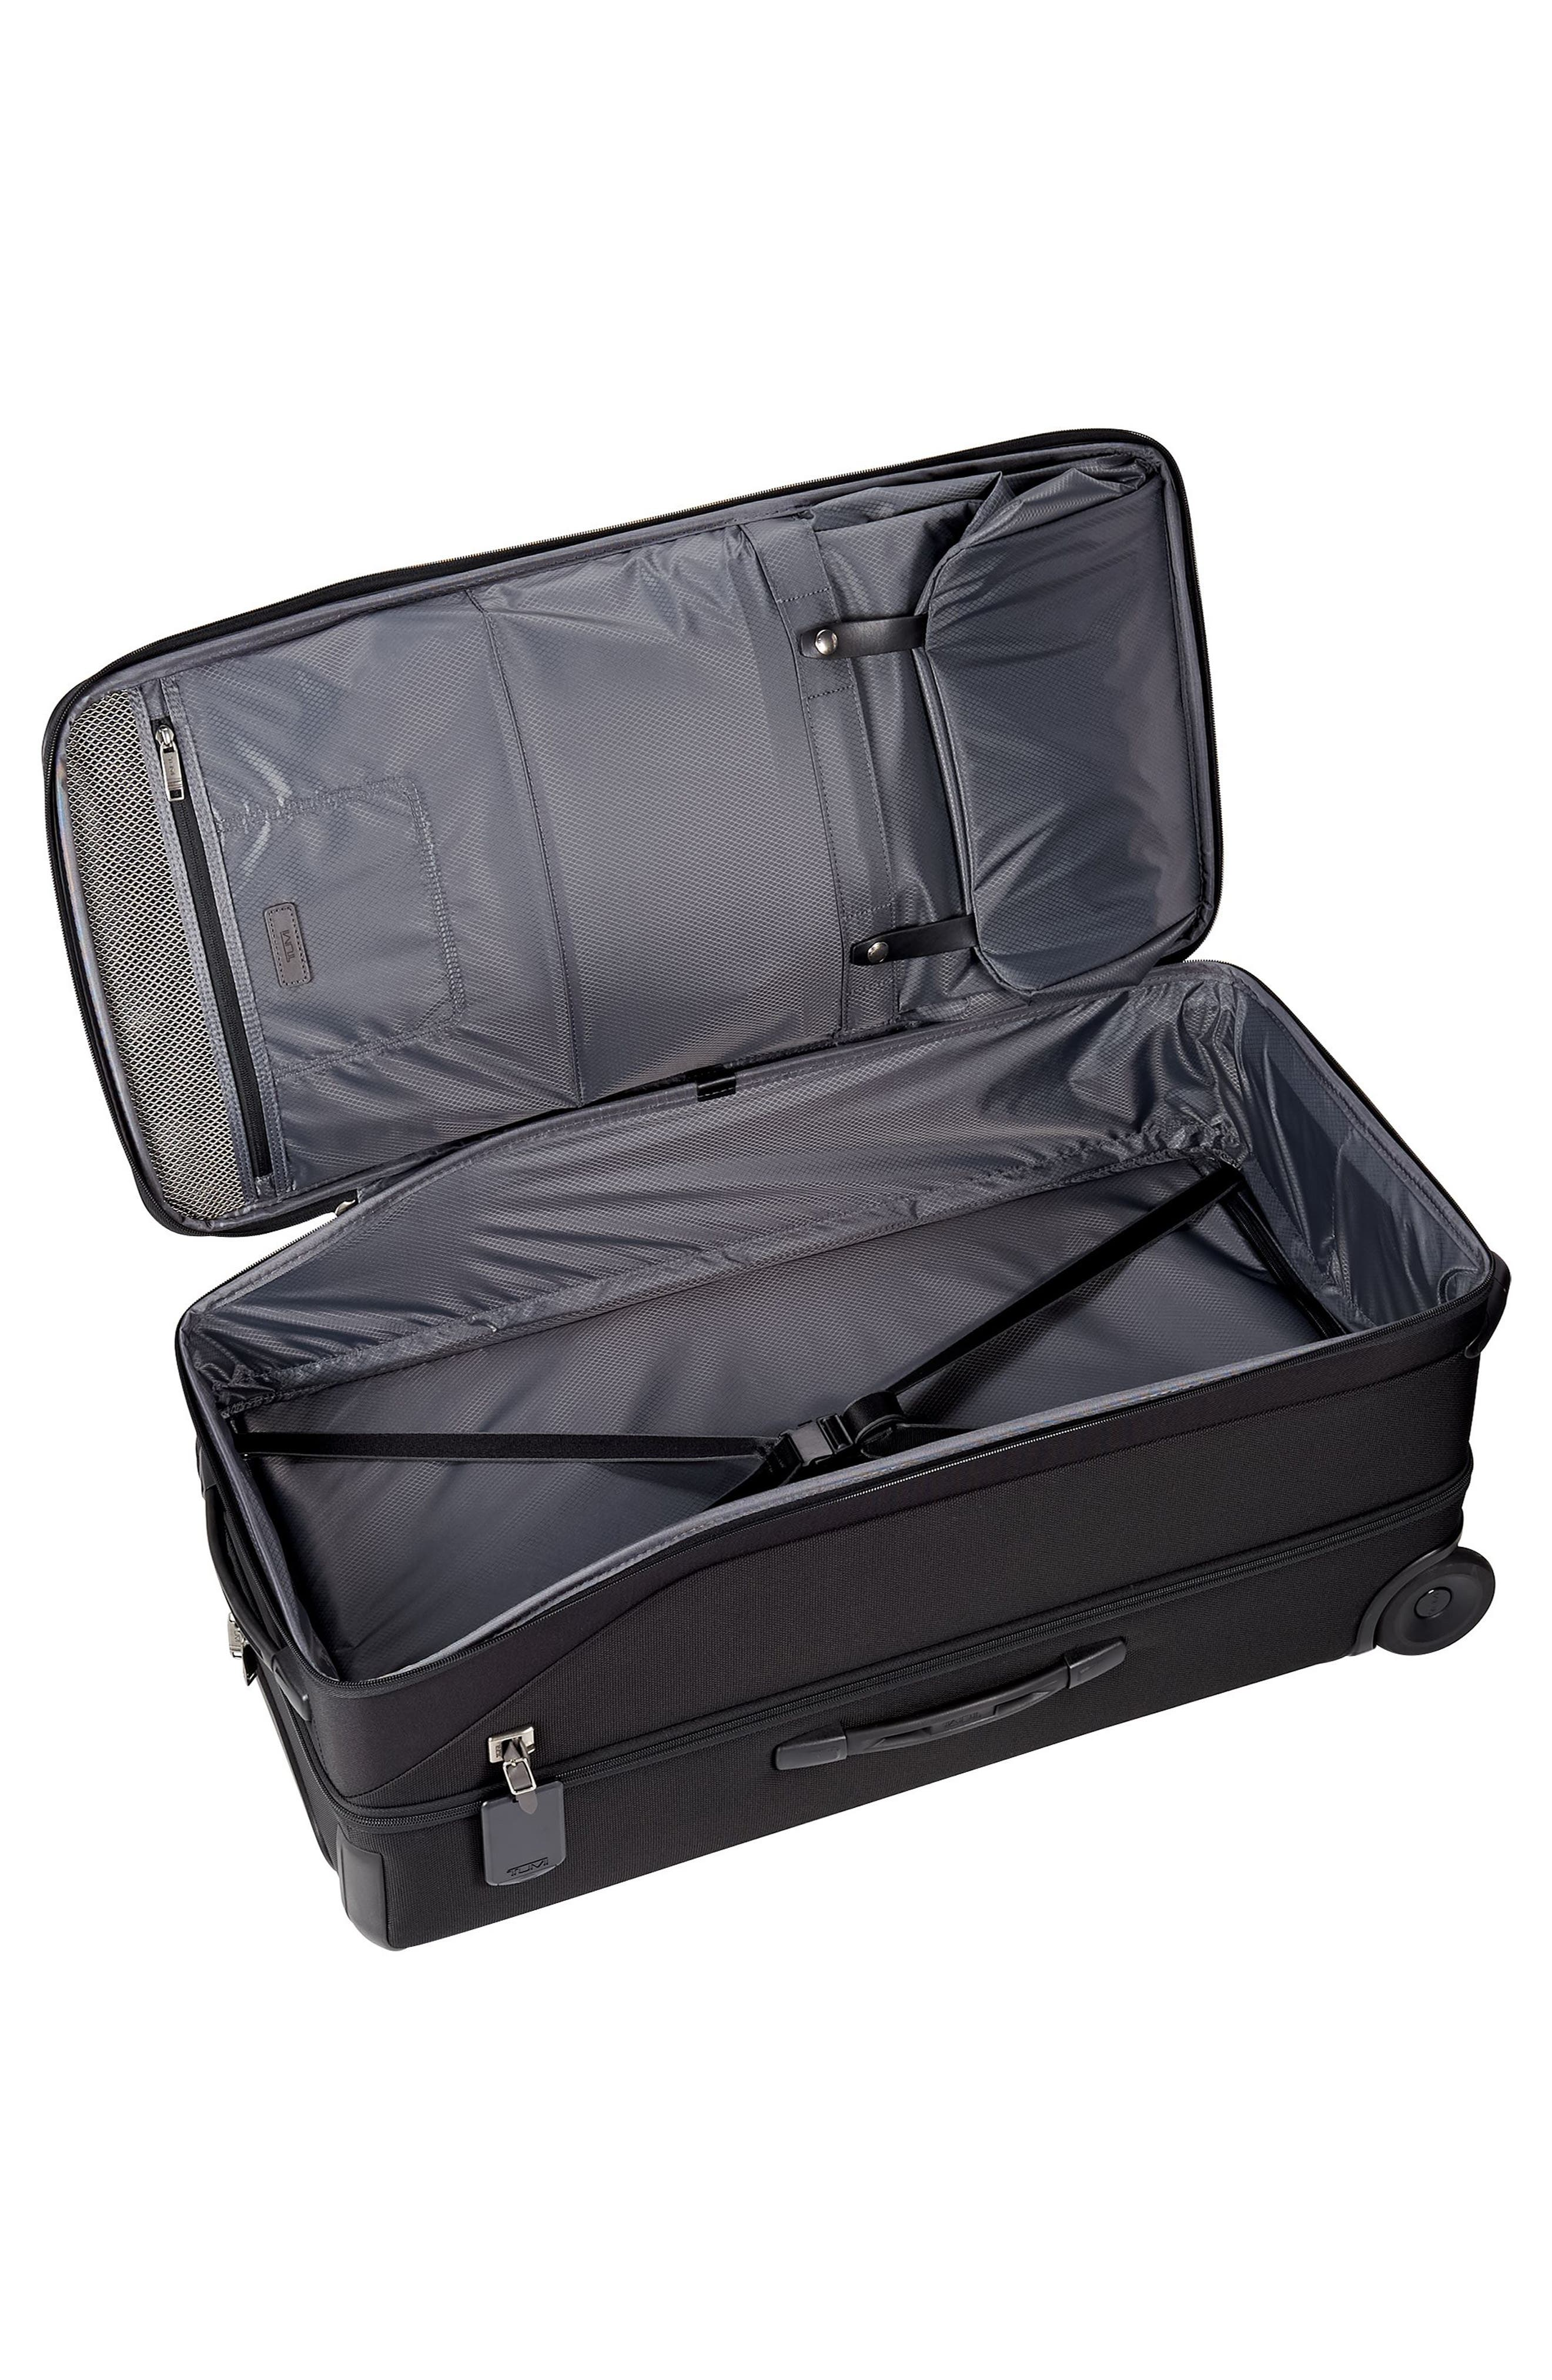 TUMI,                             Merge - 31-Inch Rolling Duffel Bag,                             Alternate thumbnail 3, color,                             BLACK CONTRAST